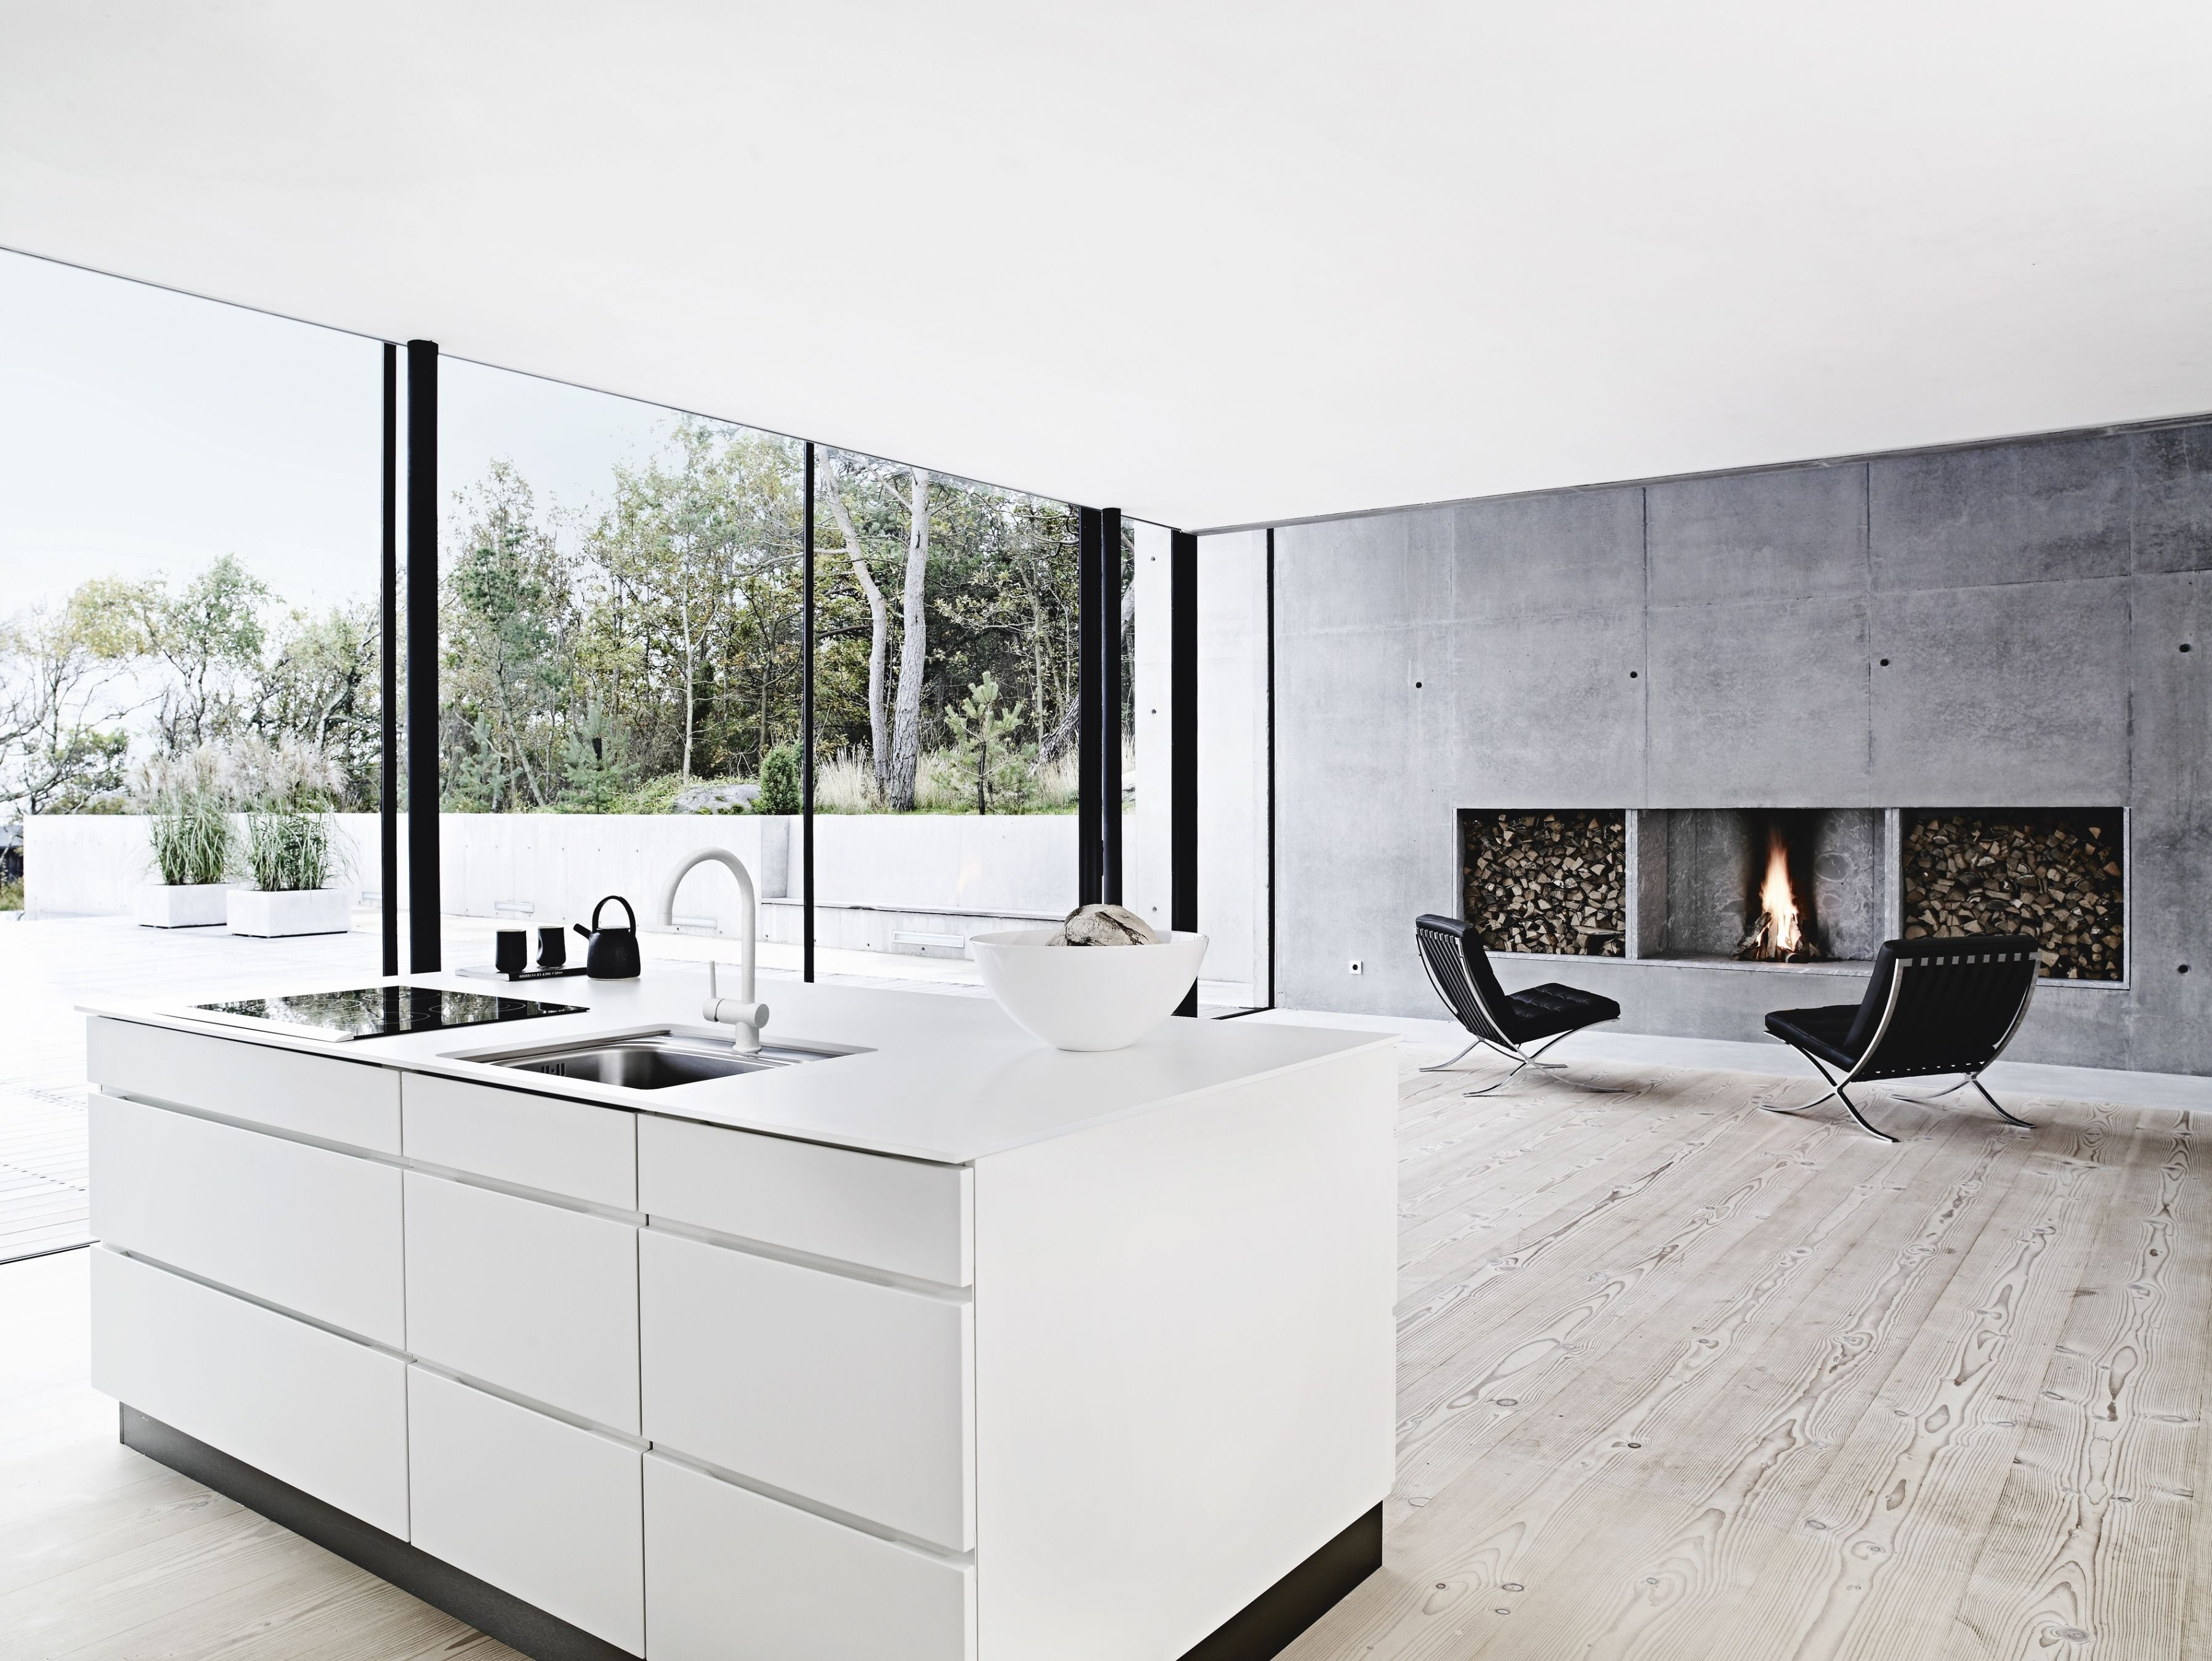 40 Phenomenon Minimalist Stylish White Kitchen Inspirations Freshouz Com White Kitchen Inspiration Kitchen Styling Bedroom Loft